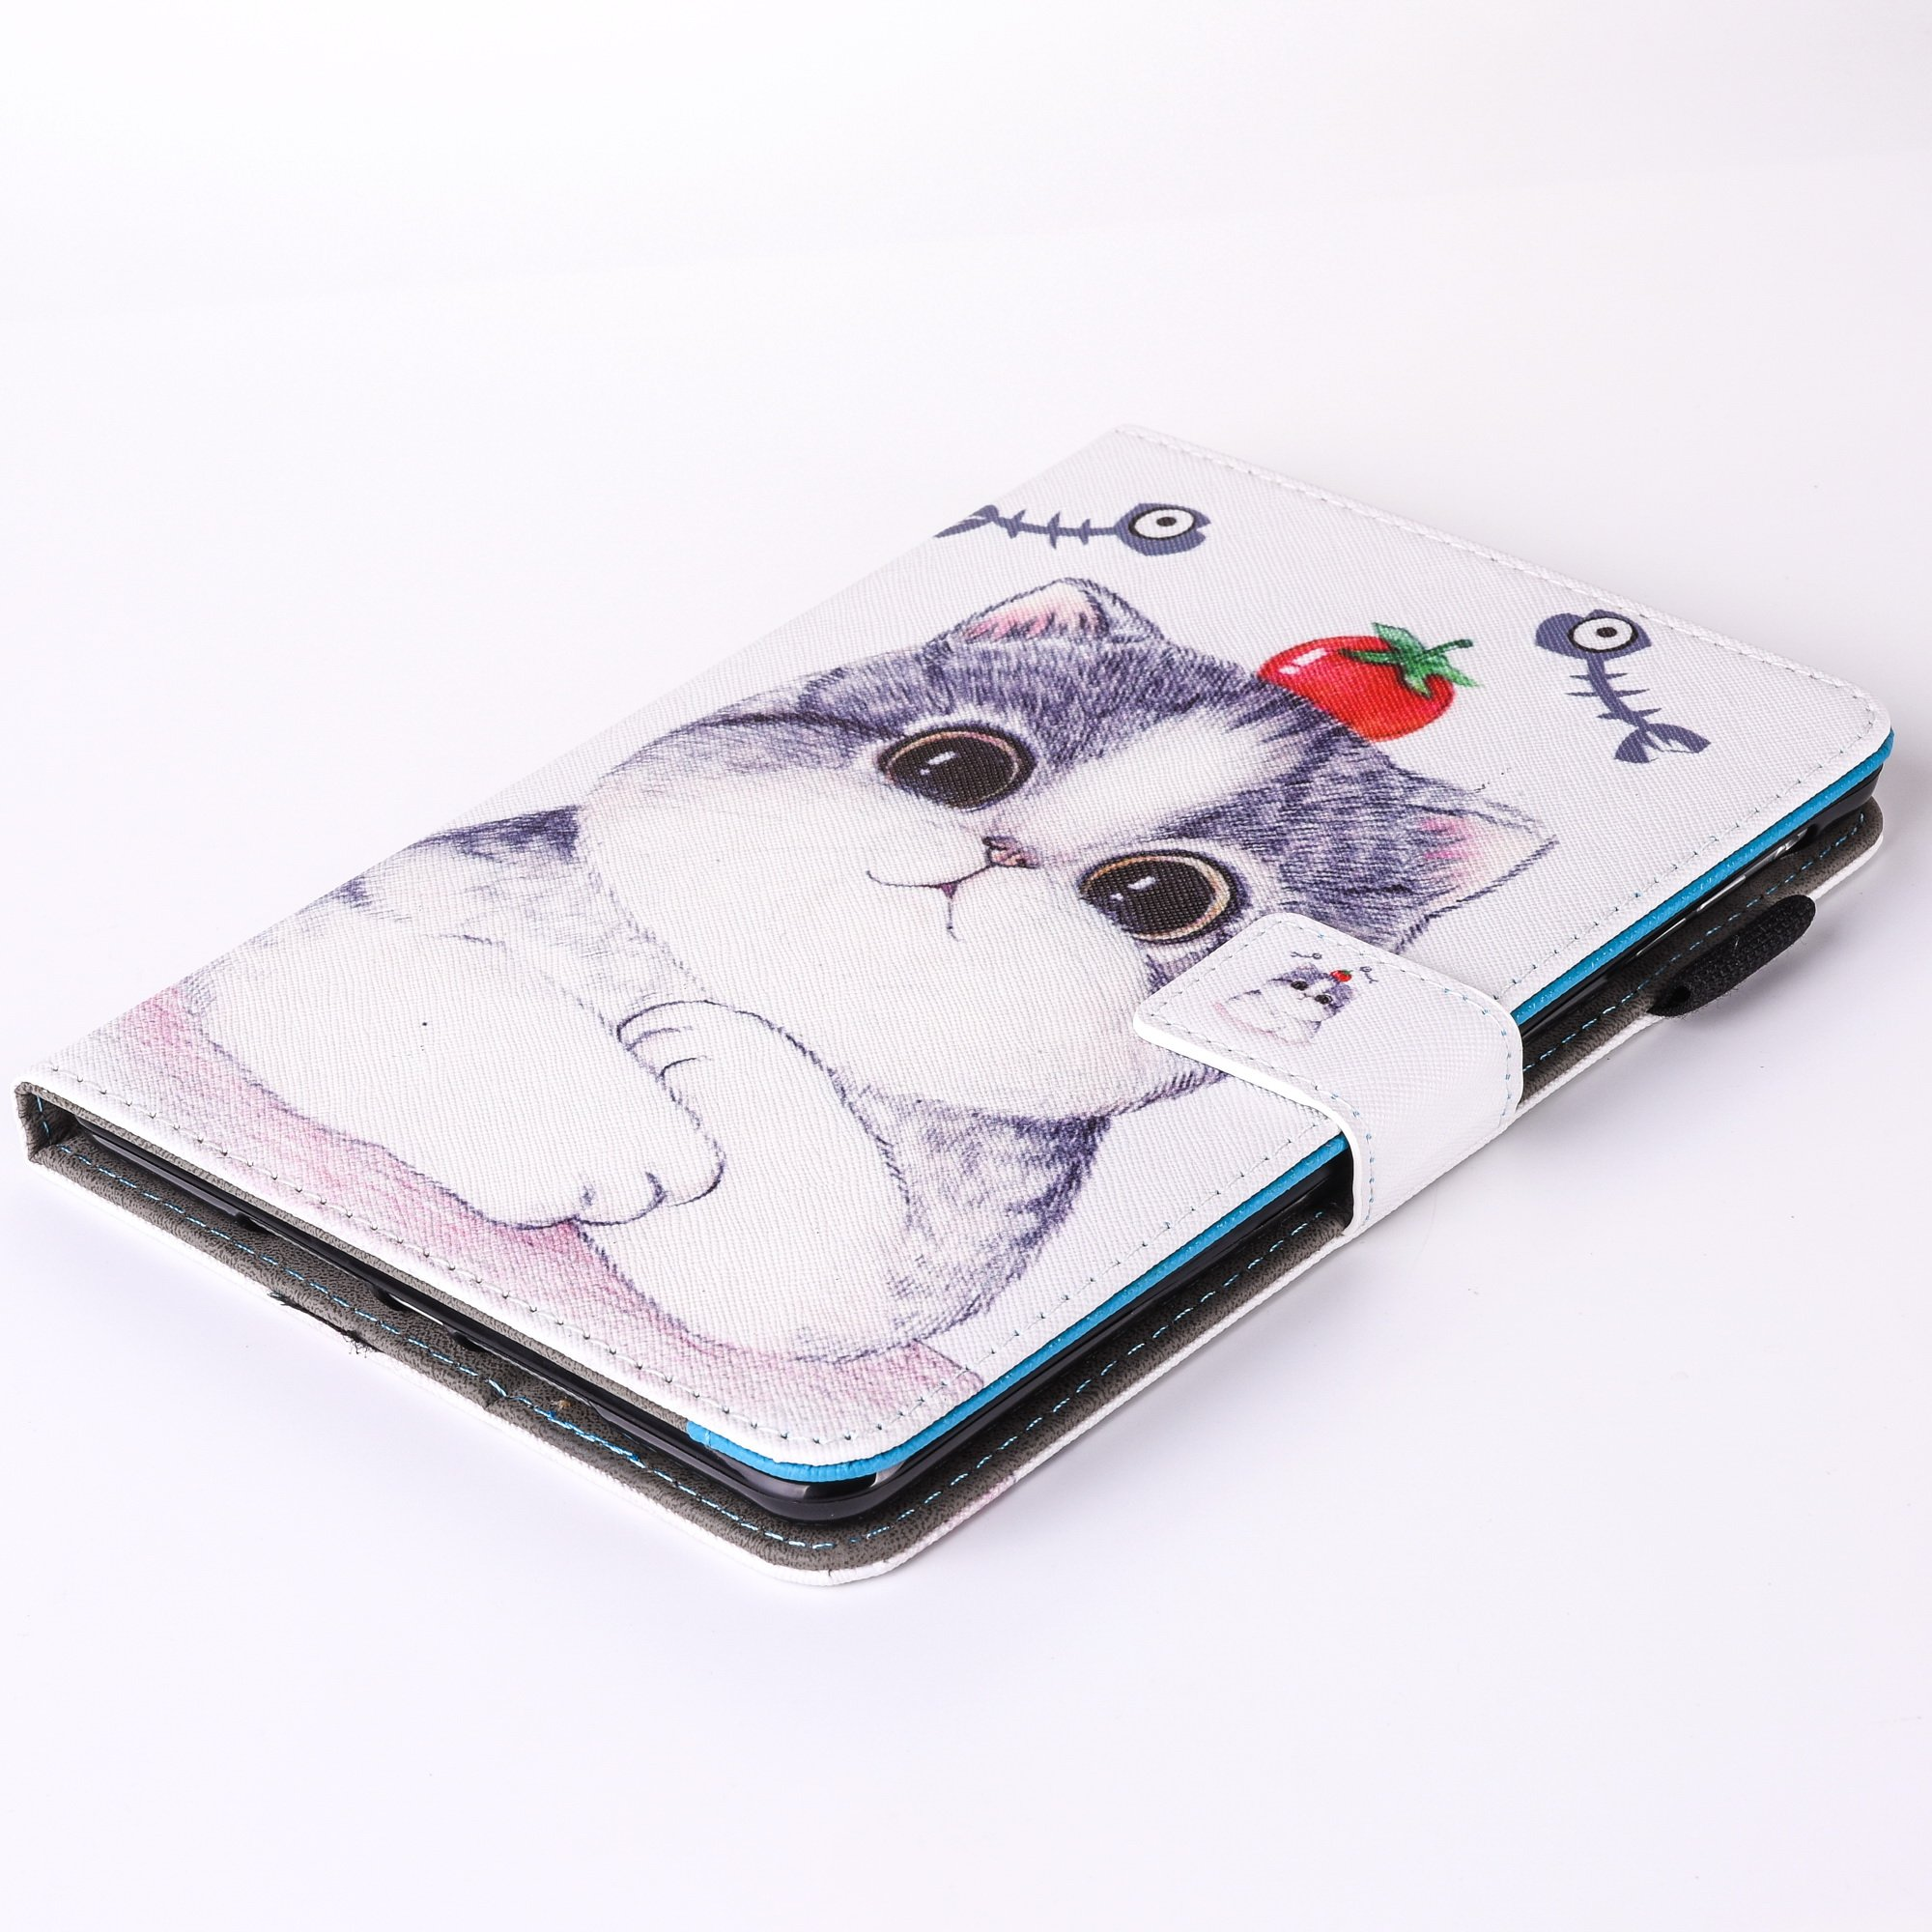 iPad Air 2/iPad Air/iPad 9.7 inch 2017 Case, PU Leather Folio [Anti-Slip] Cover with [Magnetic Closure] [Cards Slots] Auto Sleep/Wake for Apple iPad 9.7 2017/iPad Air 1&2 (iPad 5&6), Sketch Cat by Wallace Elec (Image #8)